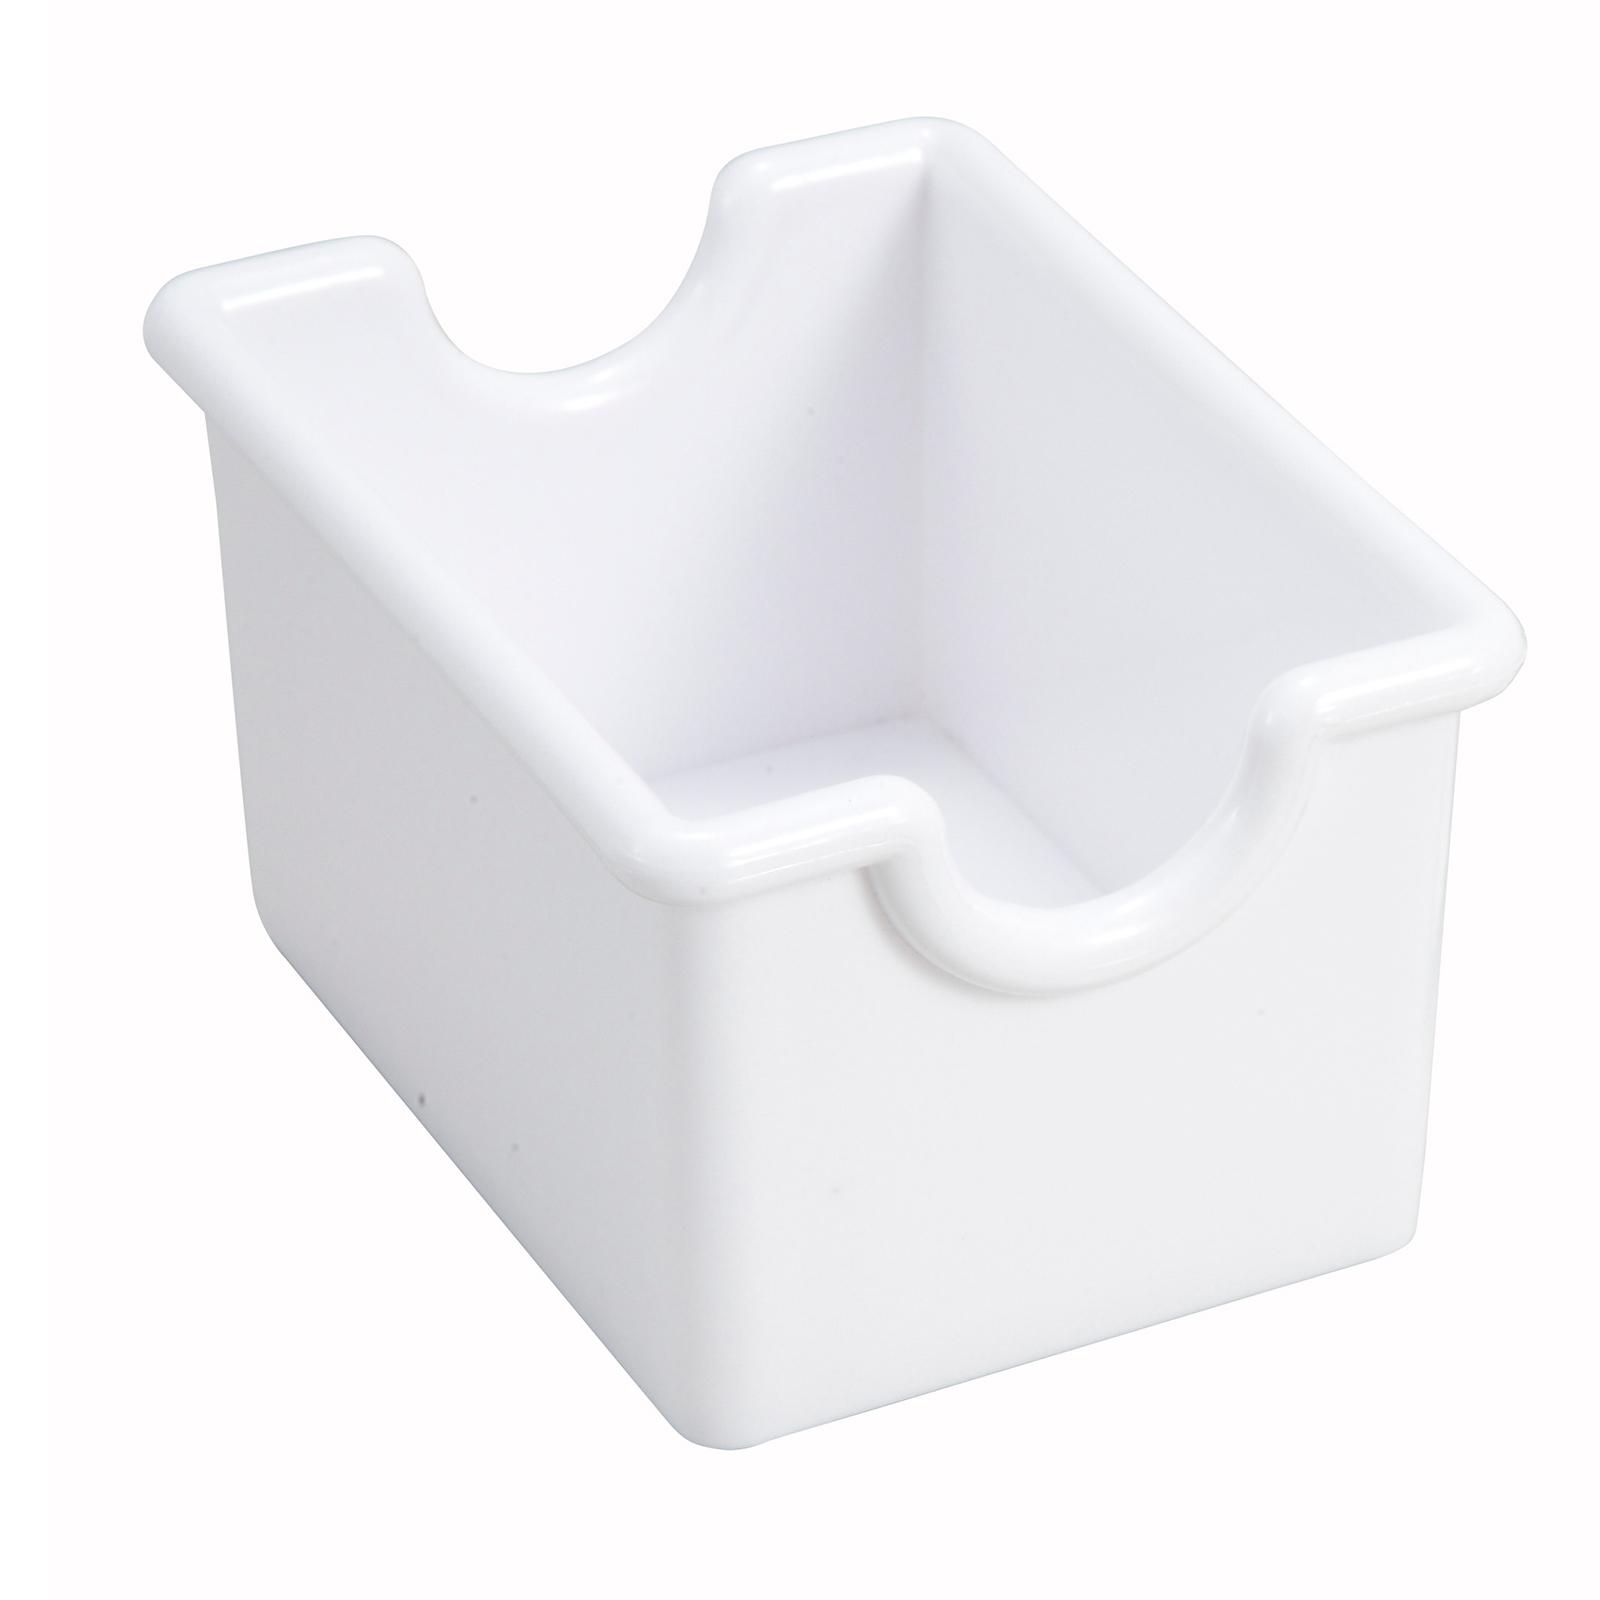 3103-15 Winco PPH-1W sugar packet holder / caddy